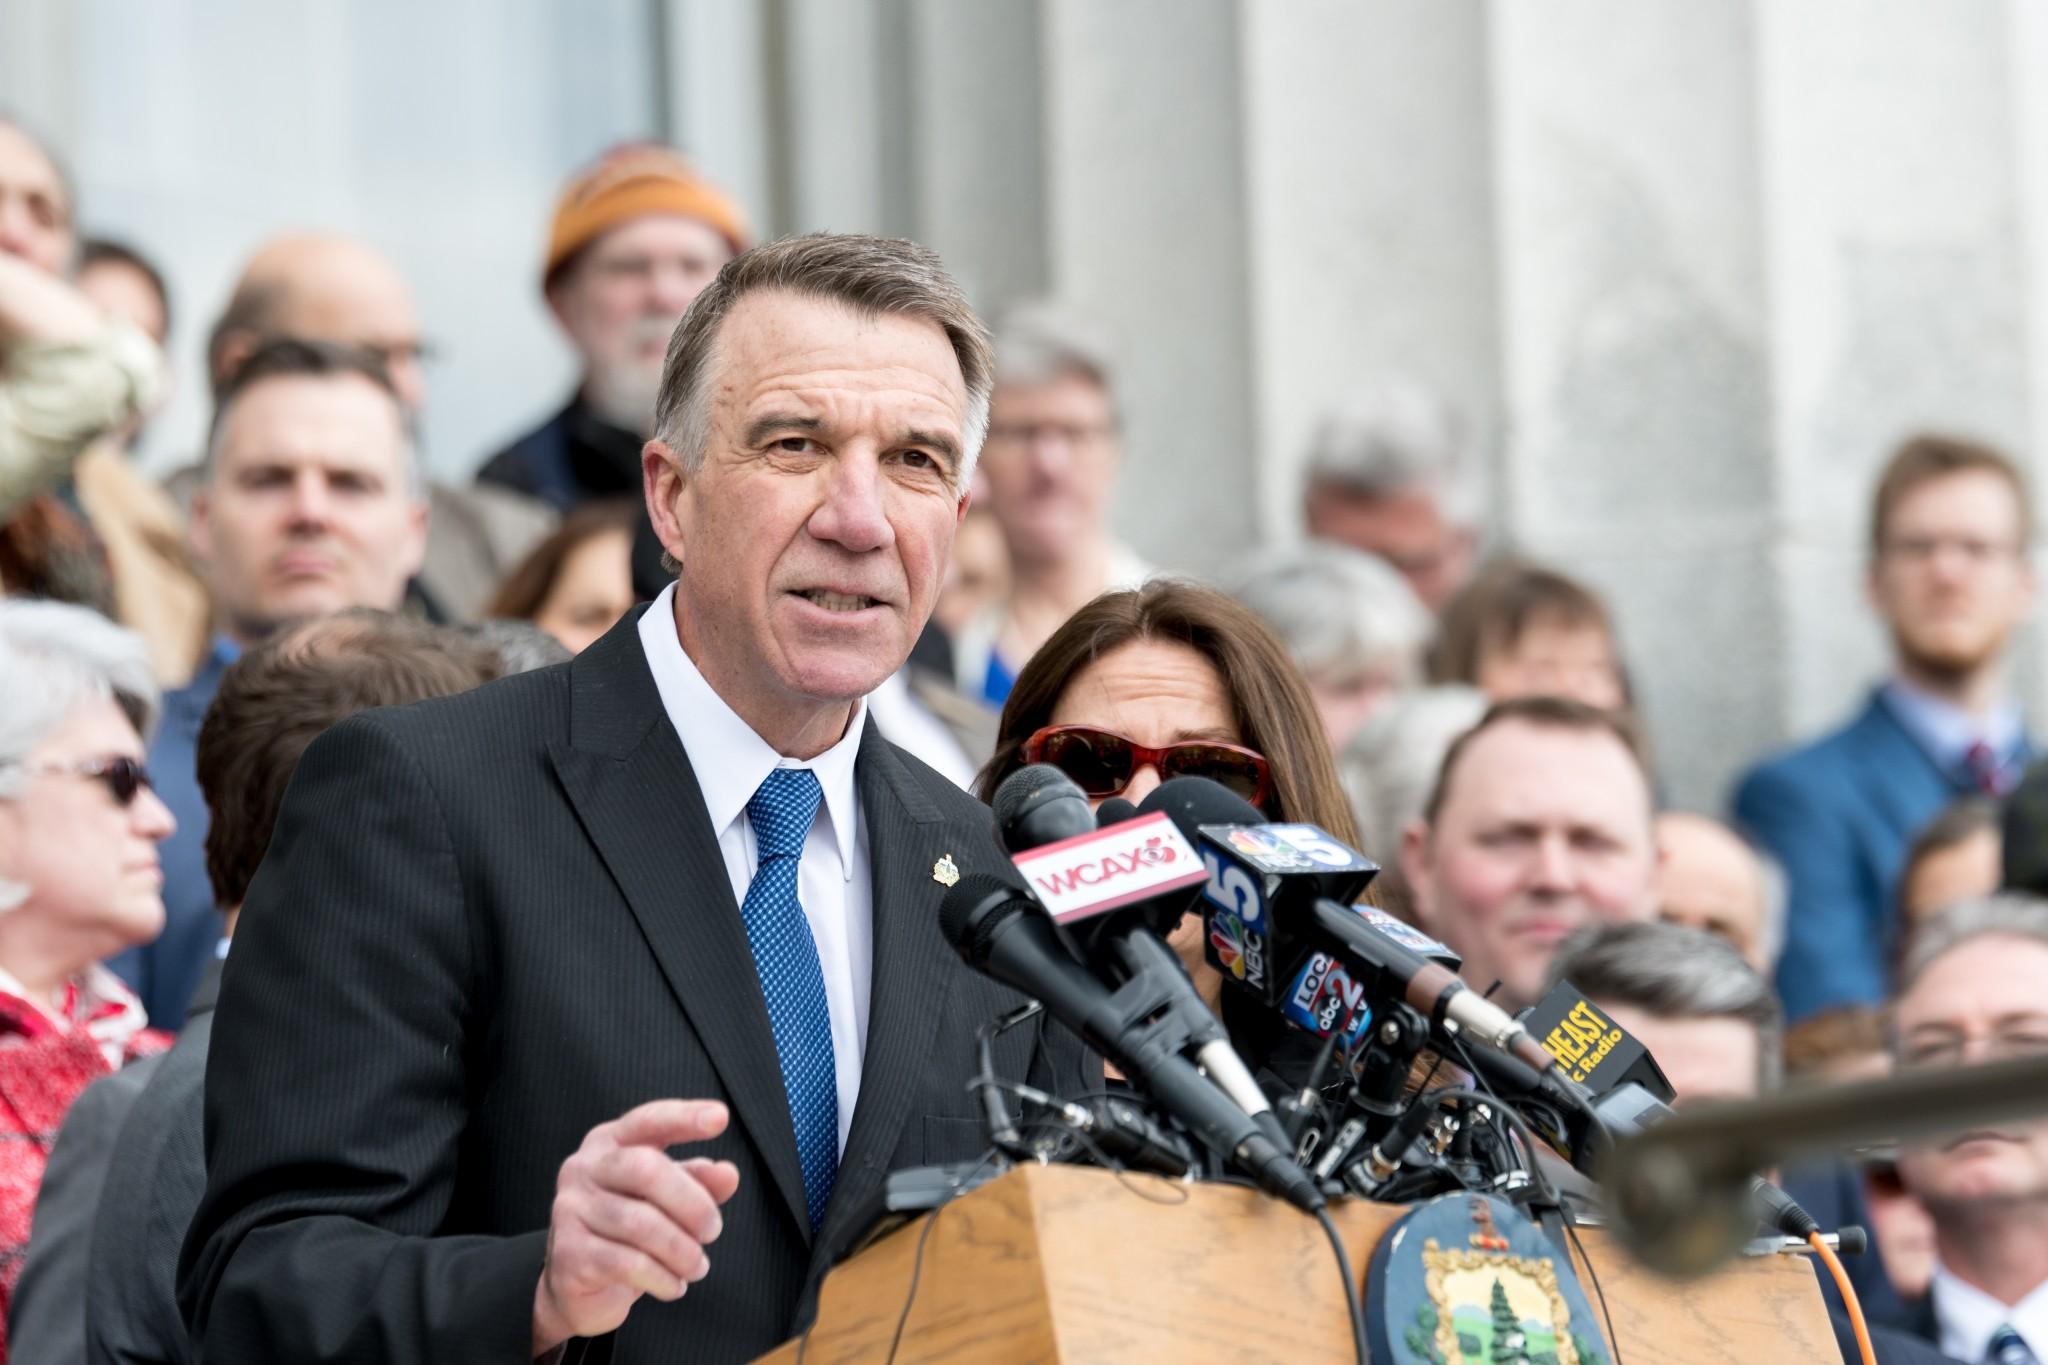 Vermont Gov. Phil Scott speaks at a rally on April 11, 2018. (Shutterstock/Bob LoCicero) spectator.org